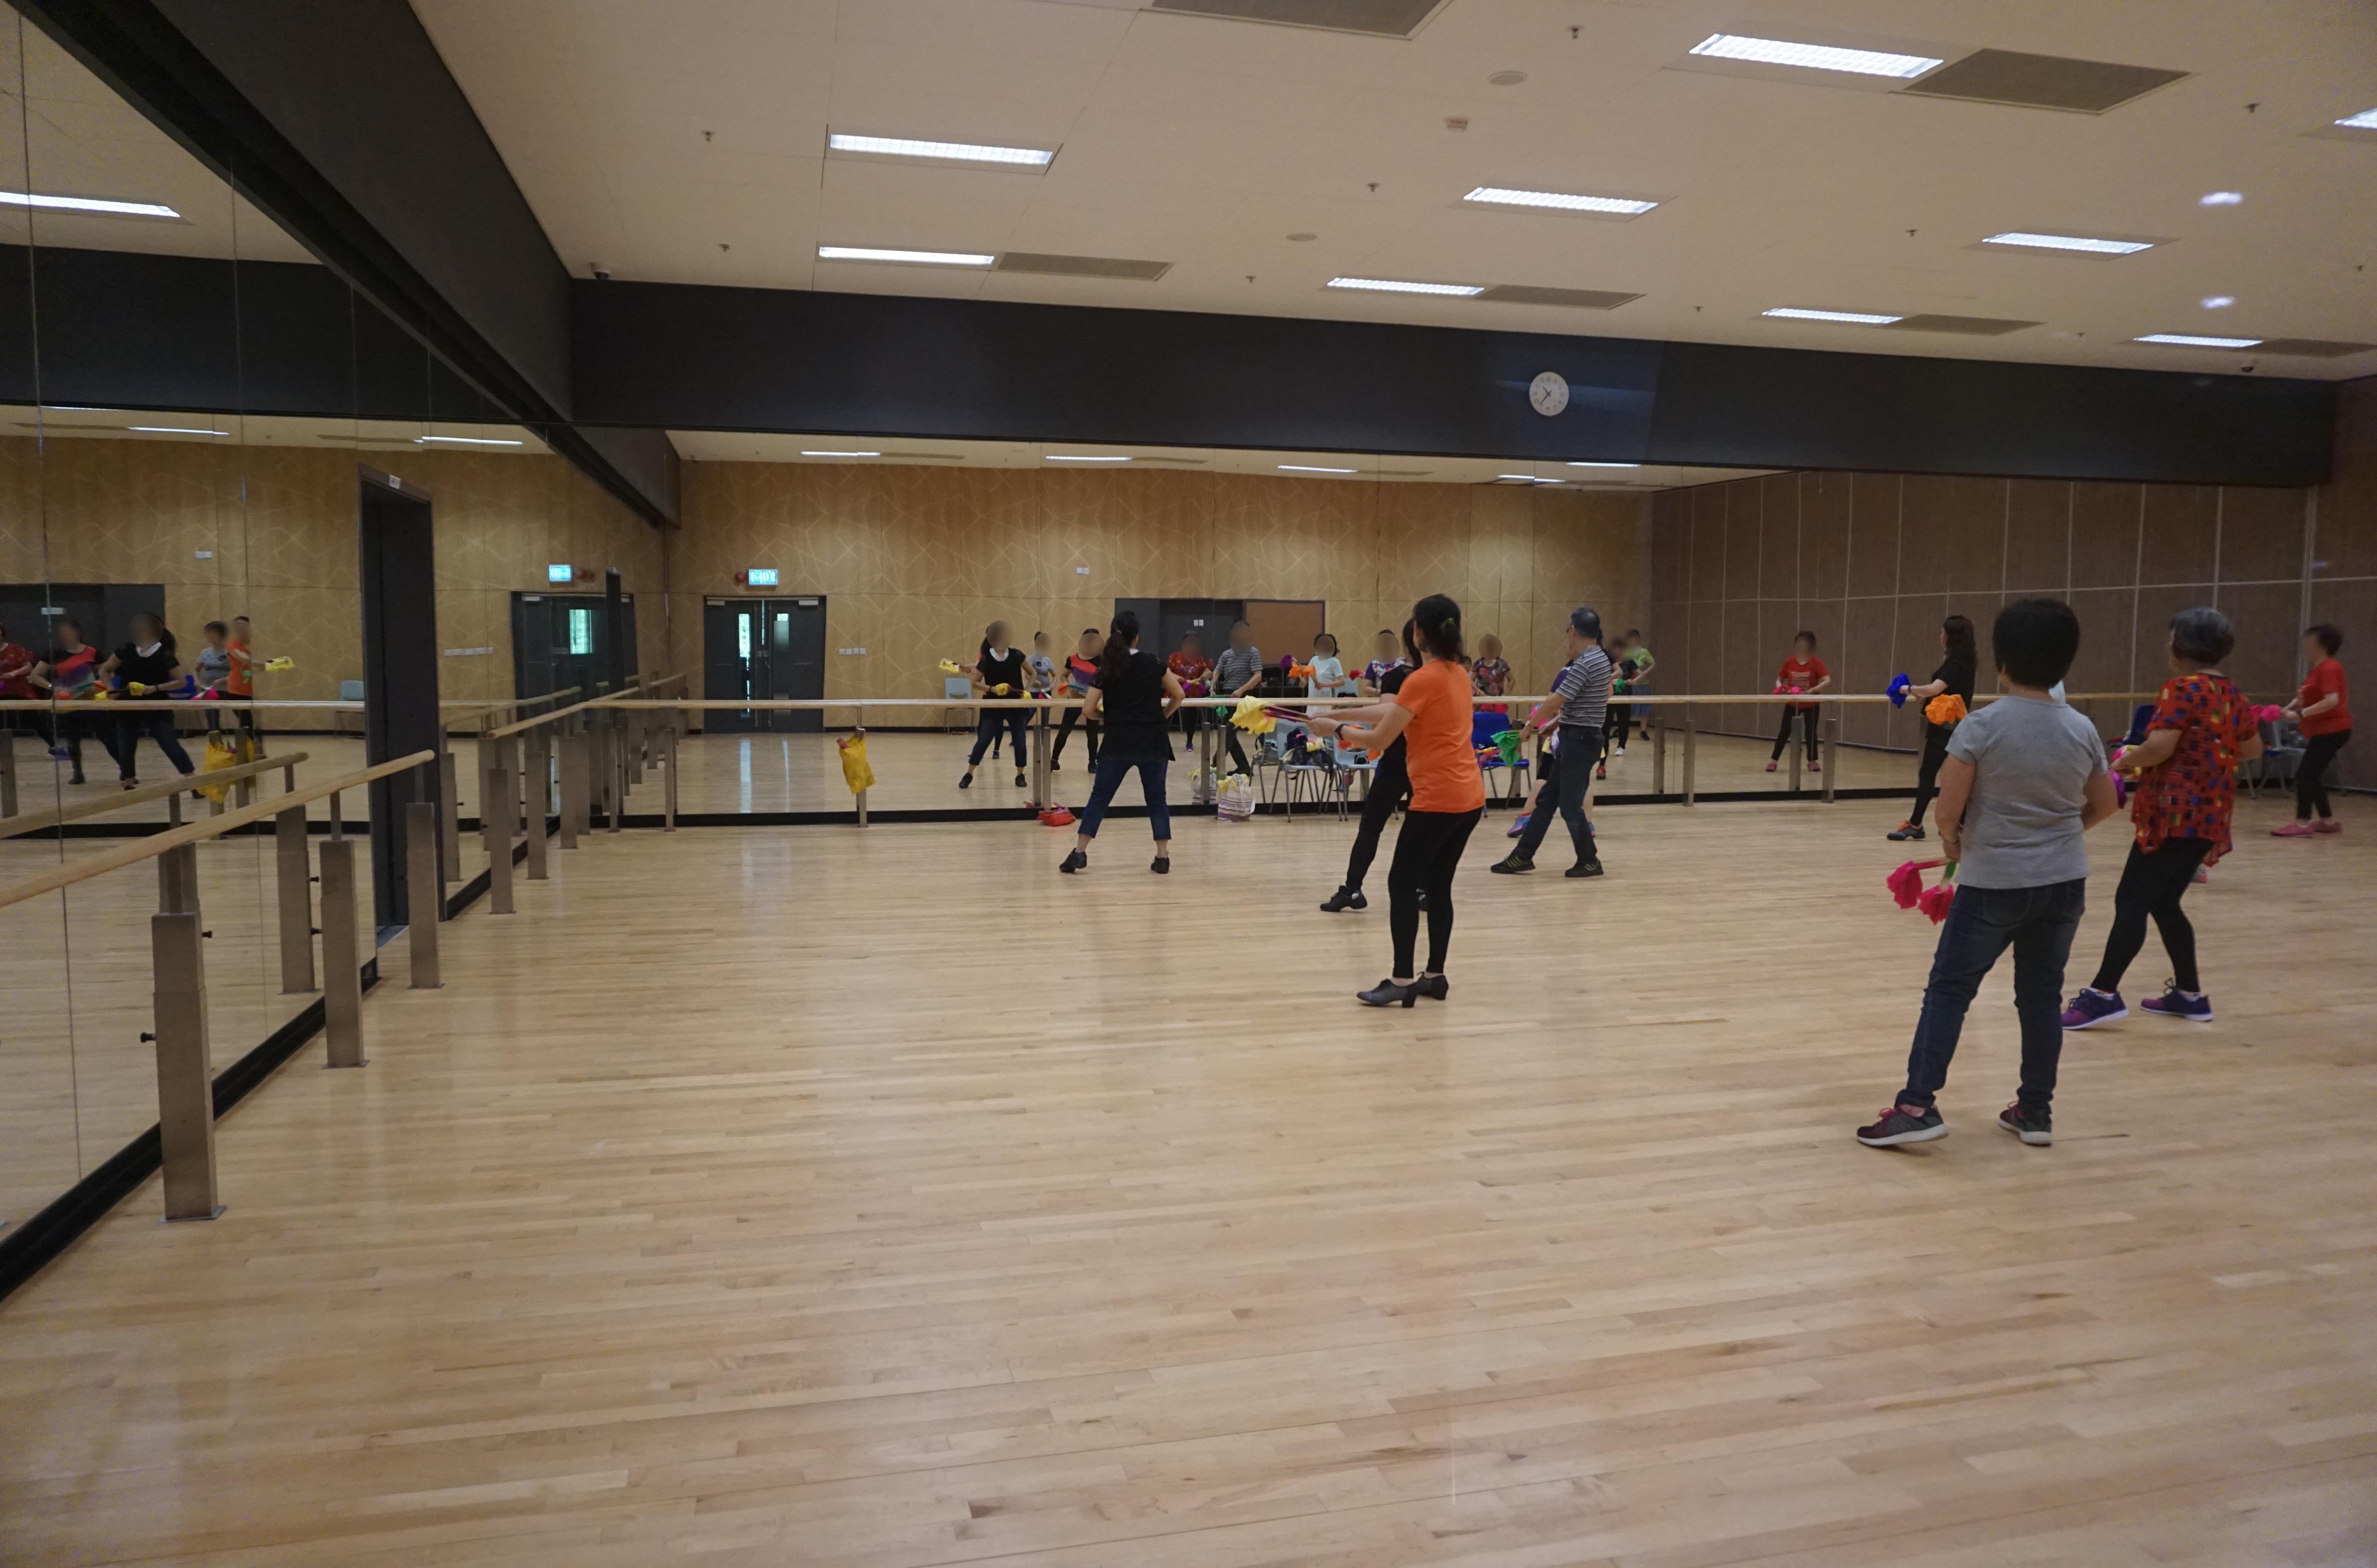 File Tsing Yi Southwest Leisure Building Dance Room Jpg Wikimedia Commons